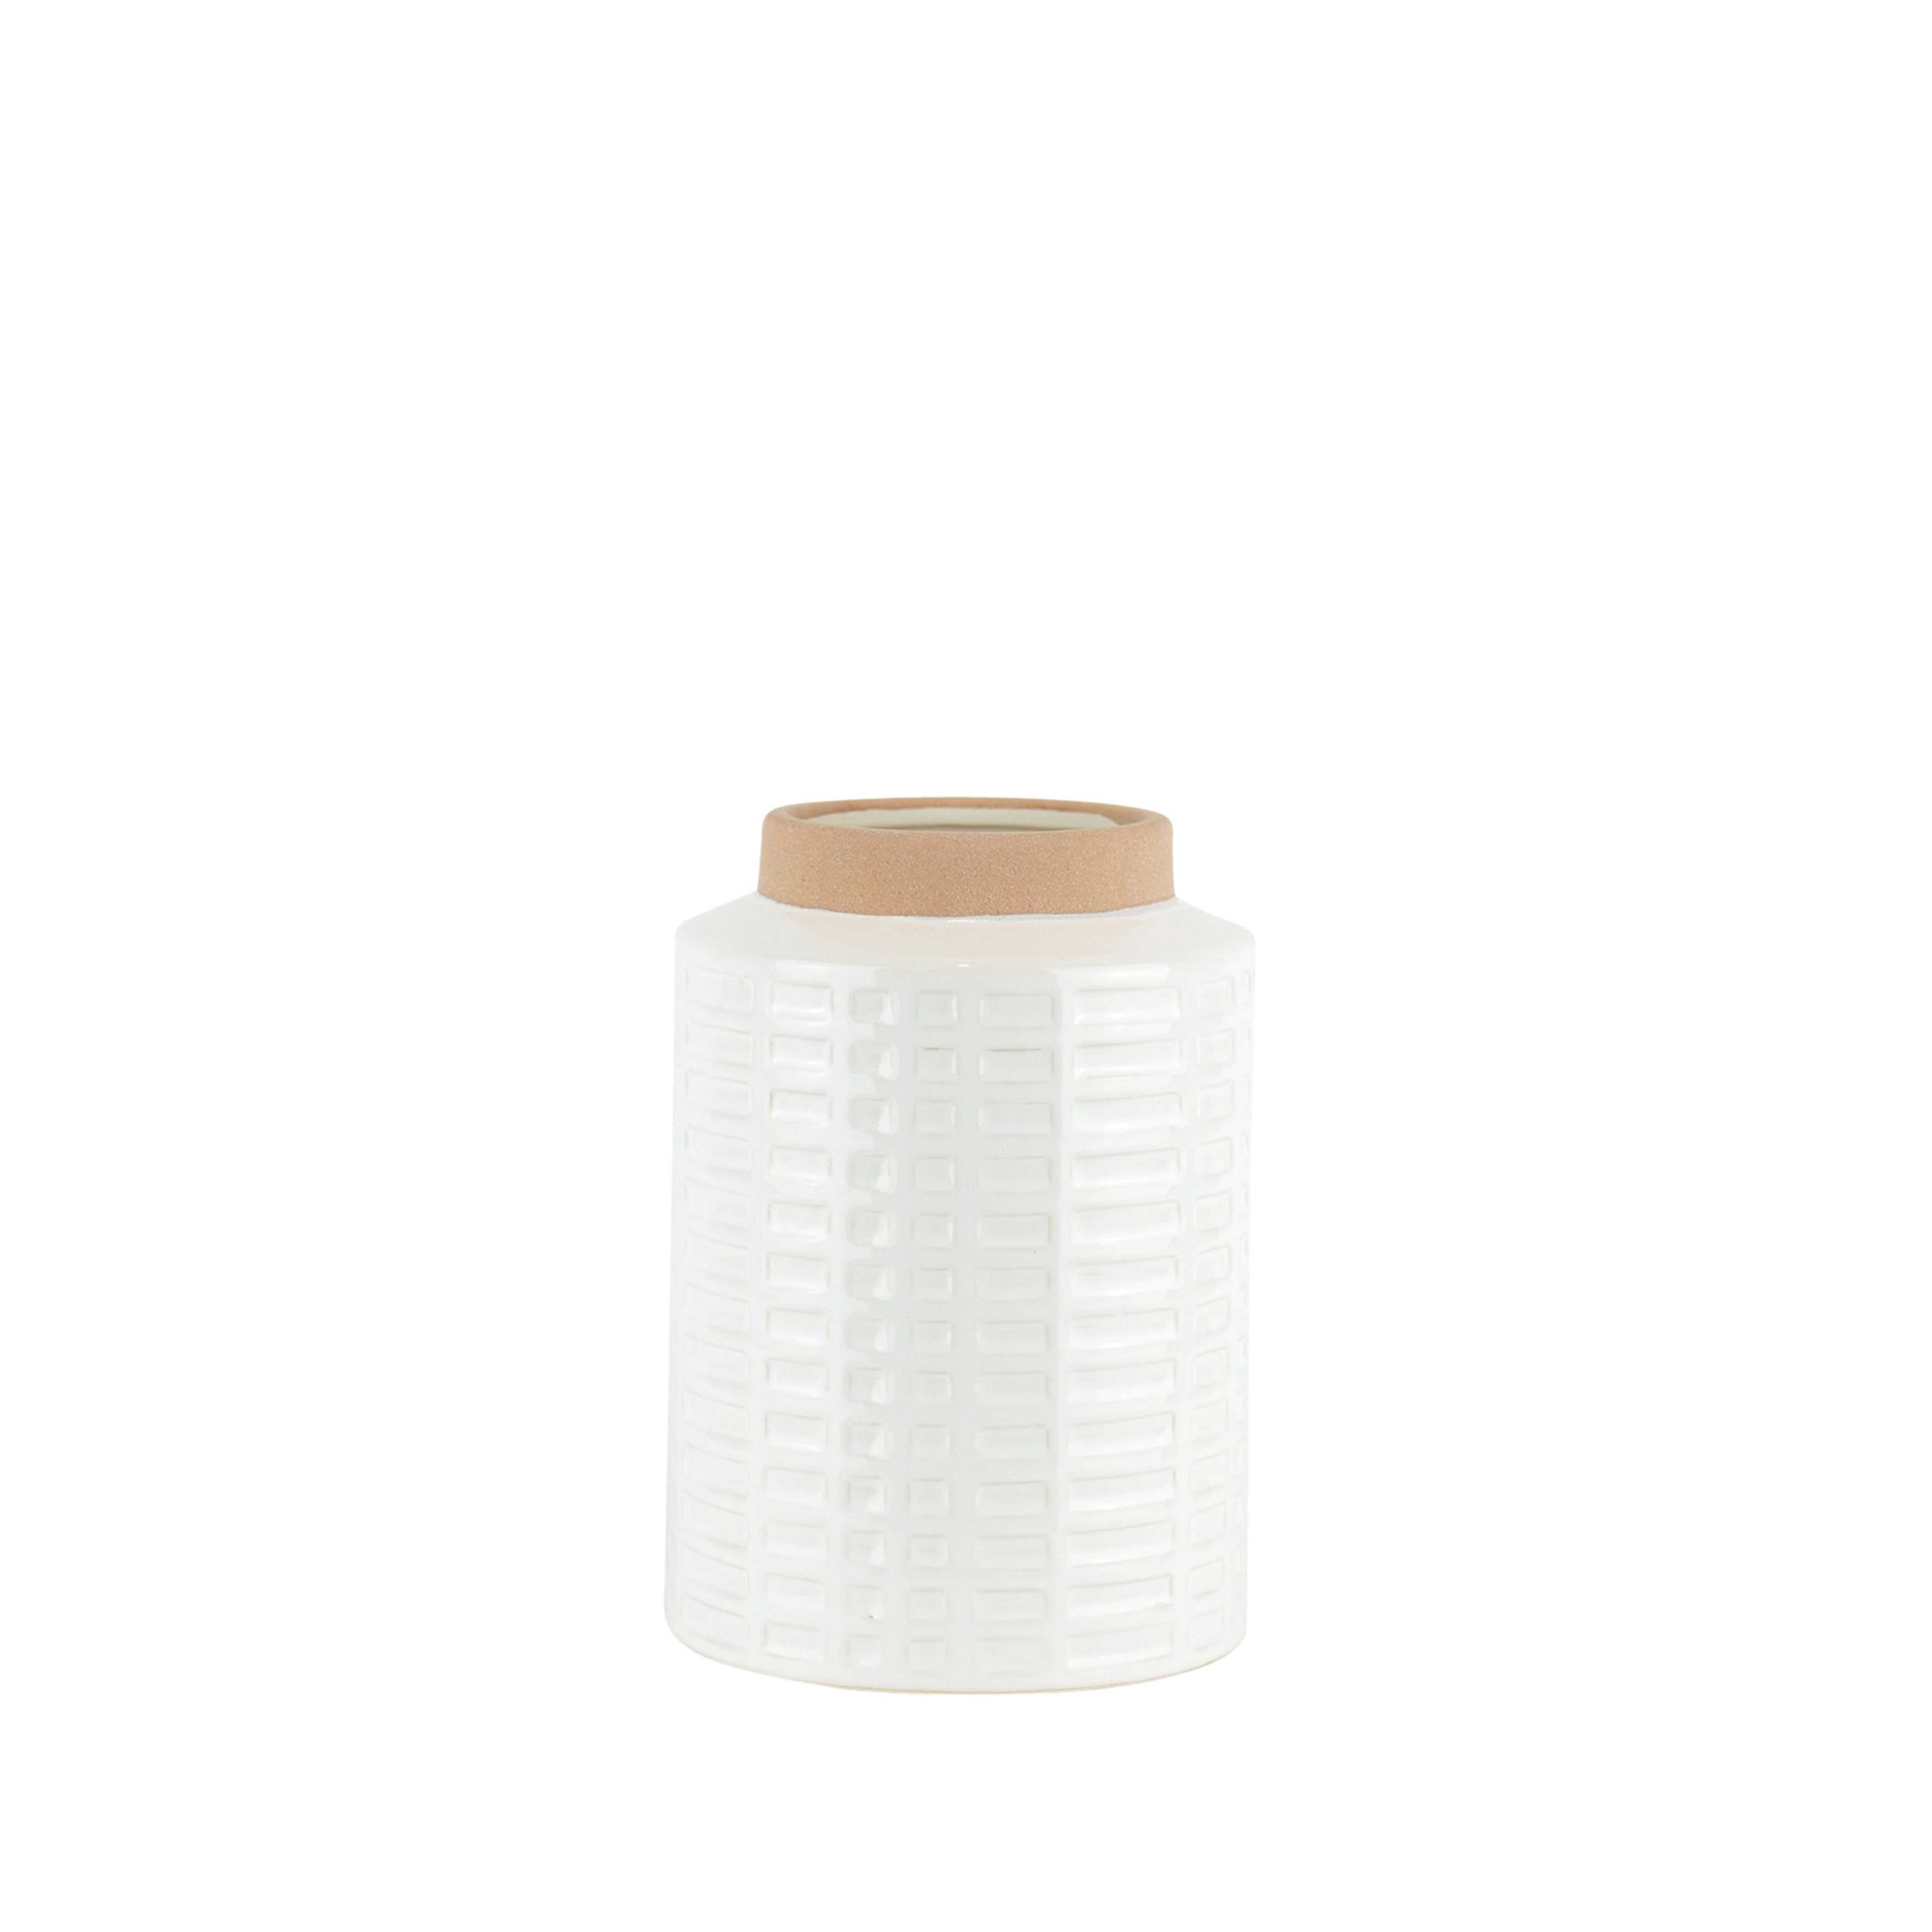 Ceramic Rim Vase with Embossed Geometric Design, White and Brown